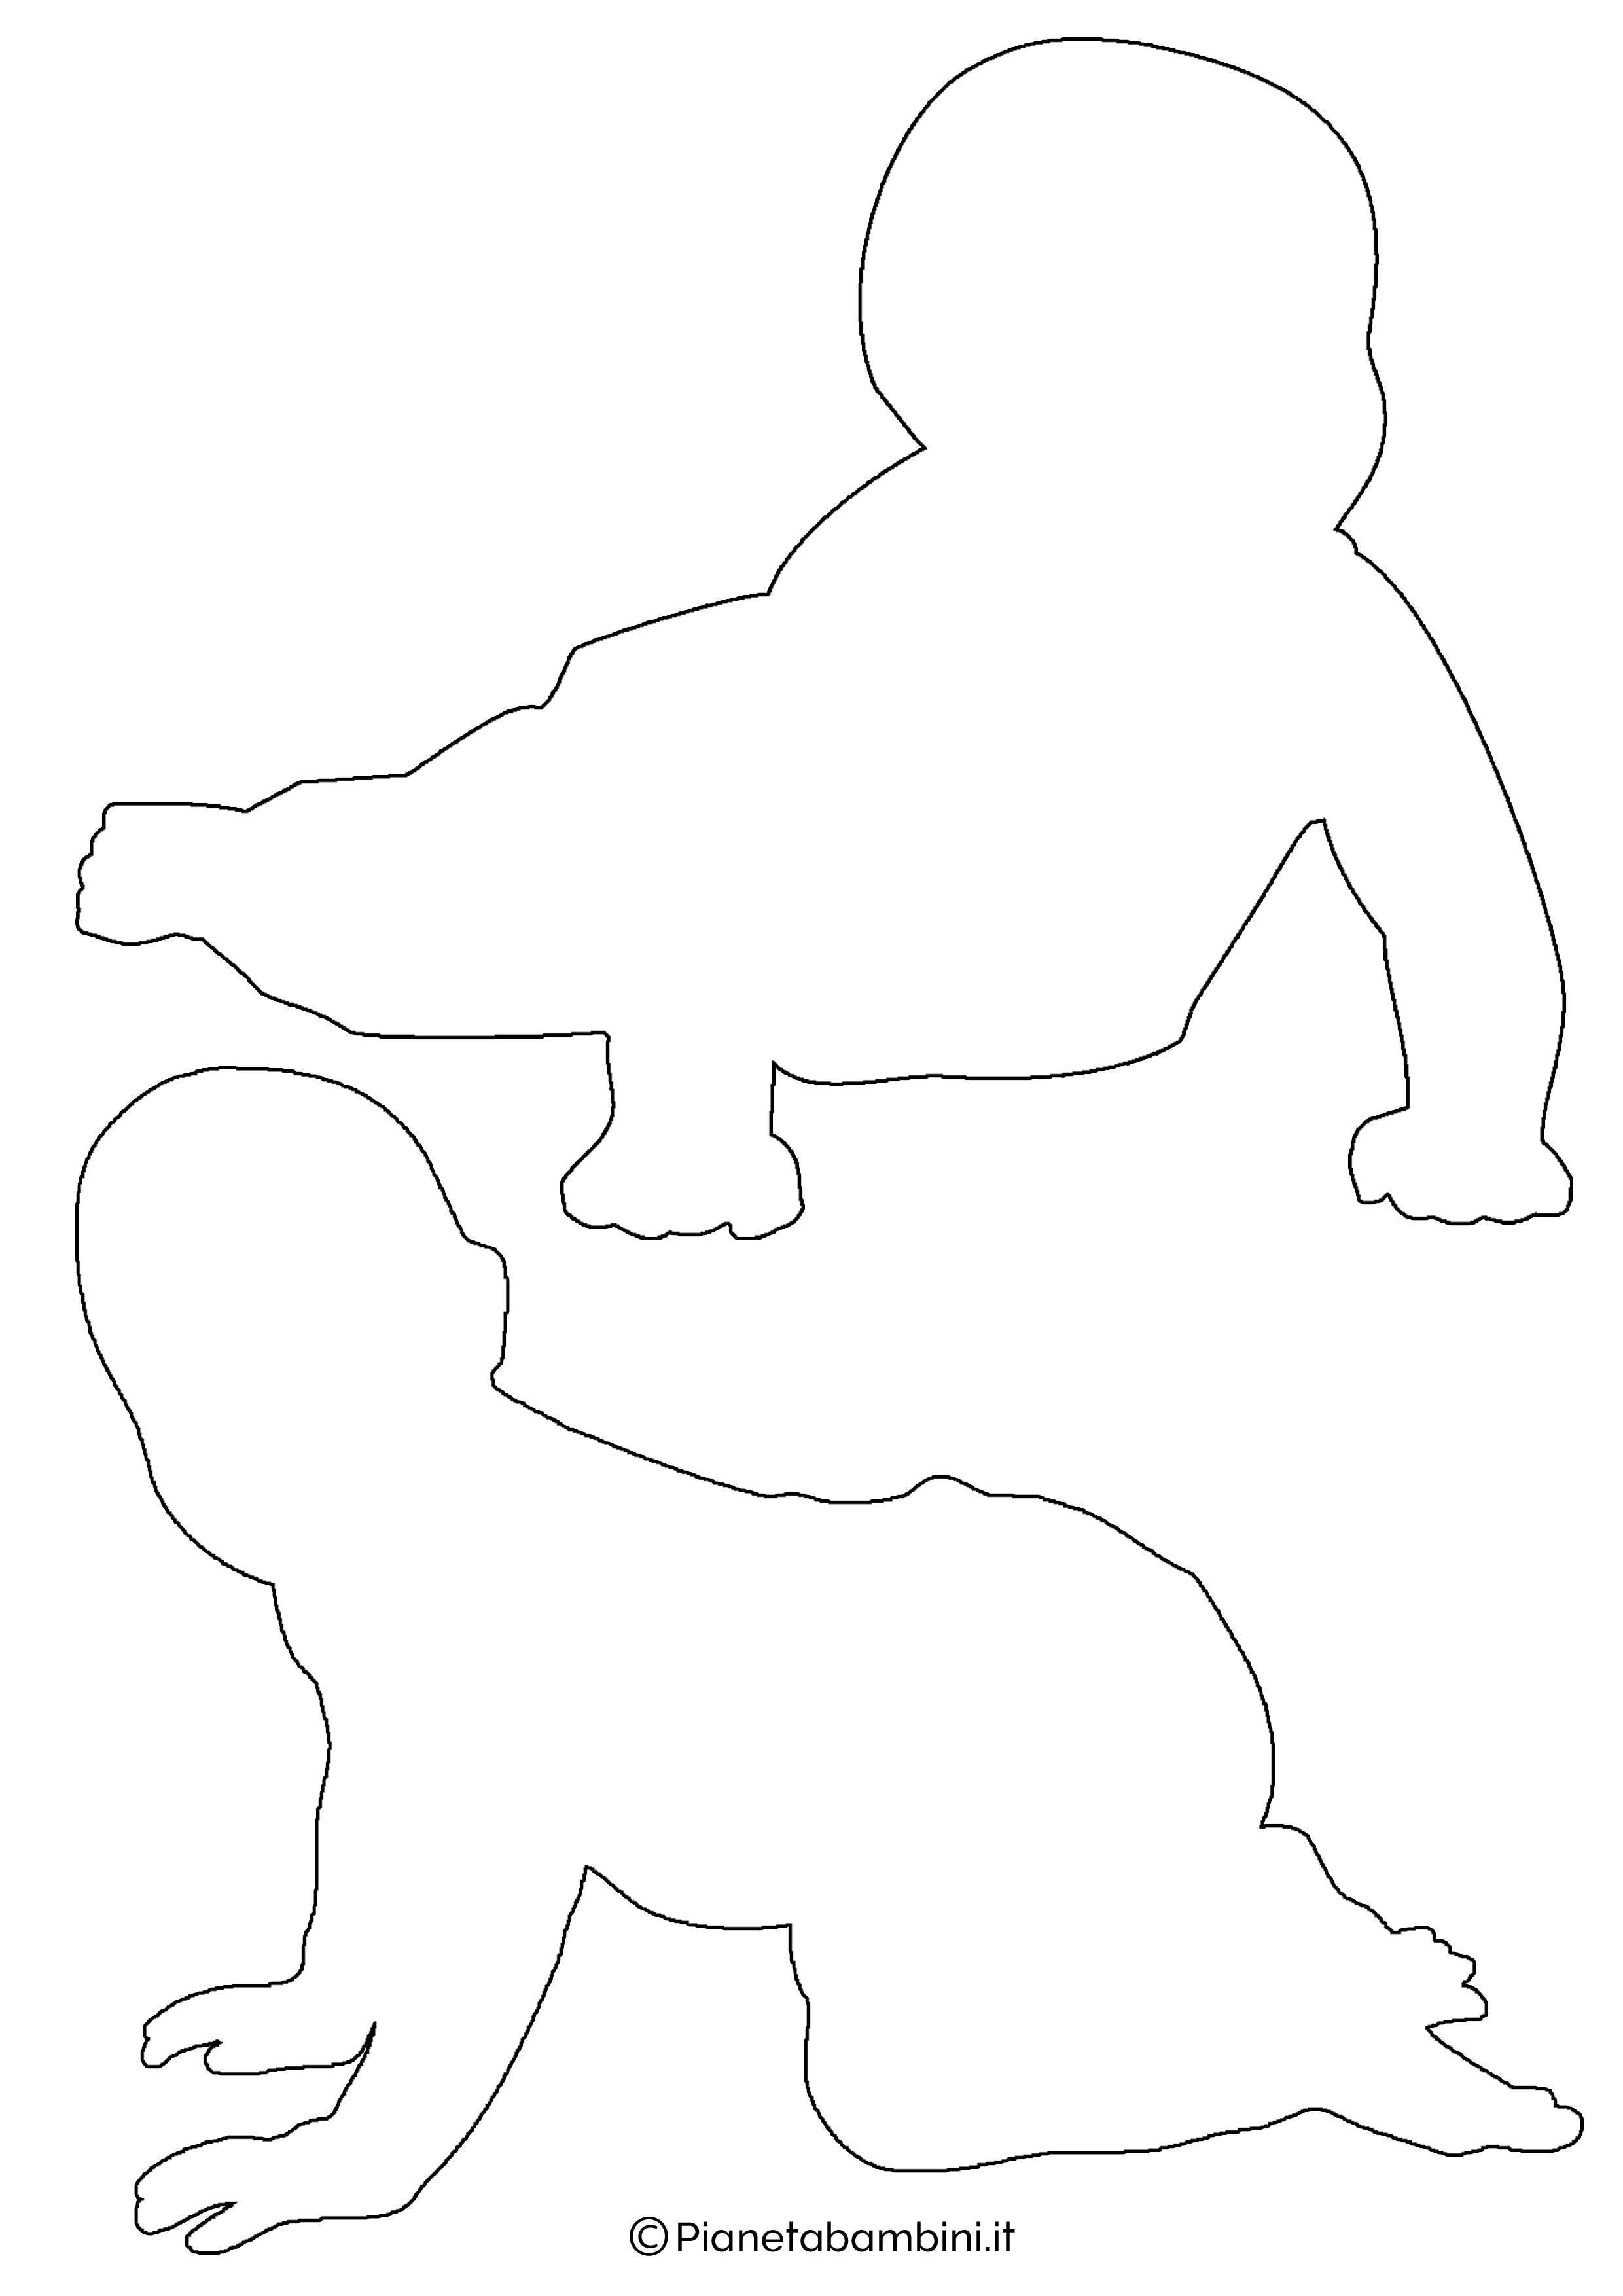 Sagome-Bambini-Grandi-01